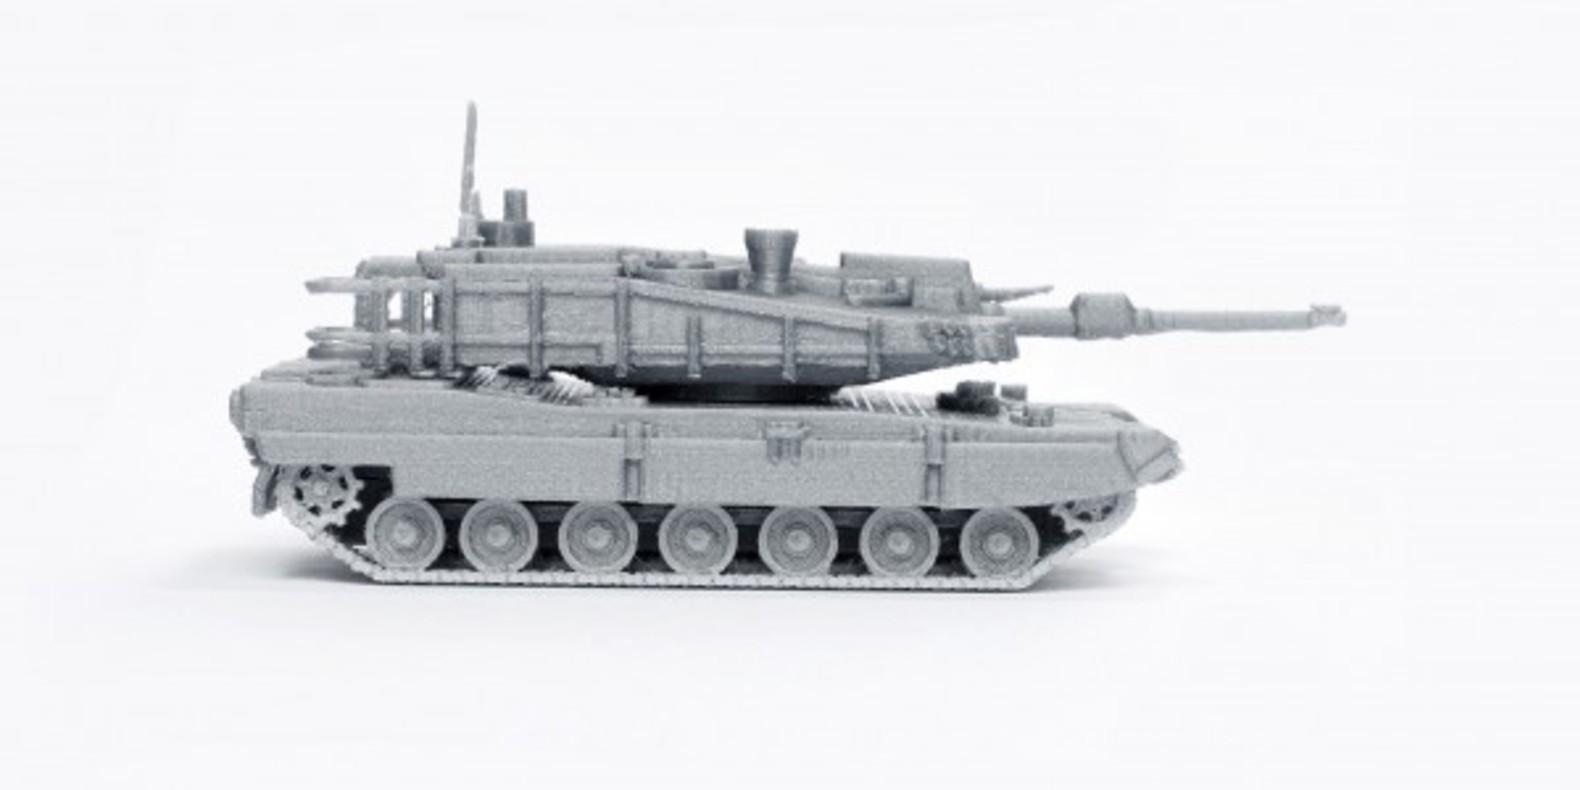 tanks-duc-tran-formbyte-fichier-3d-stl-gratuit-cults-3